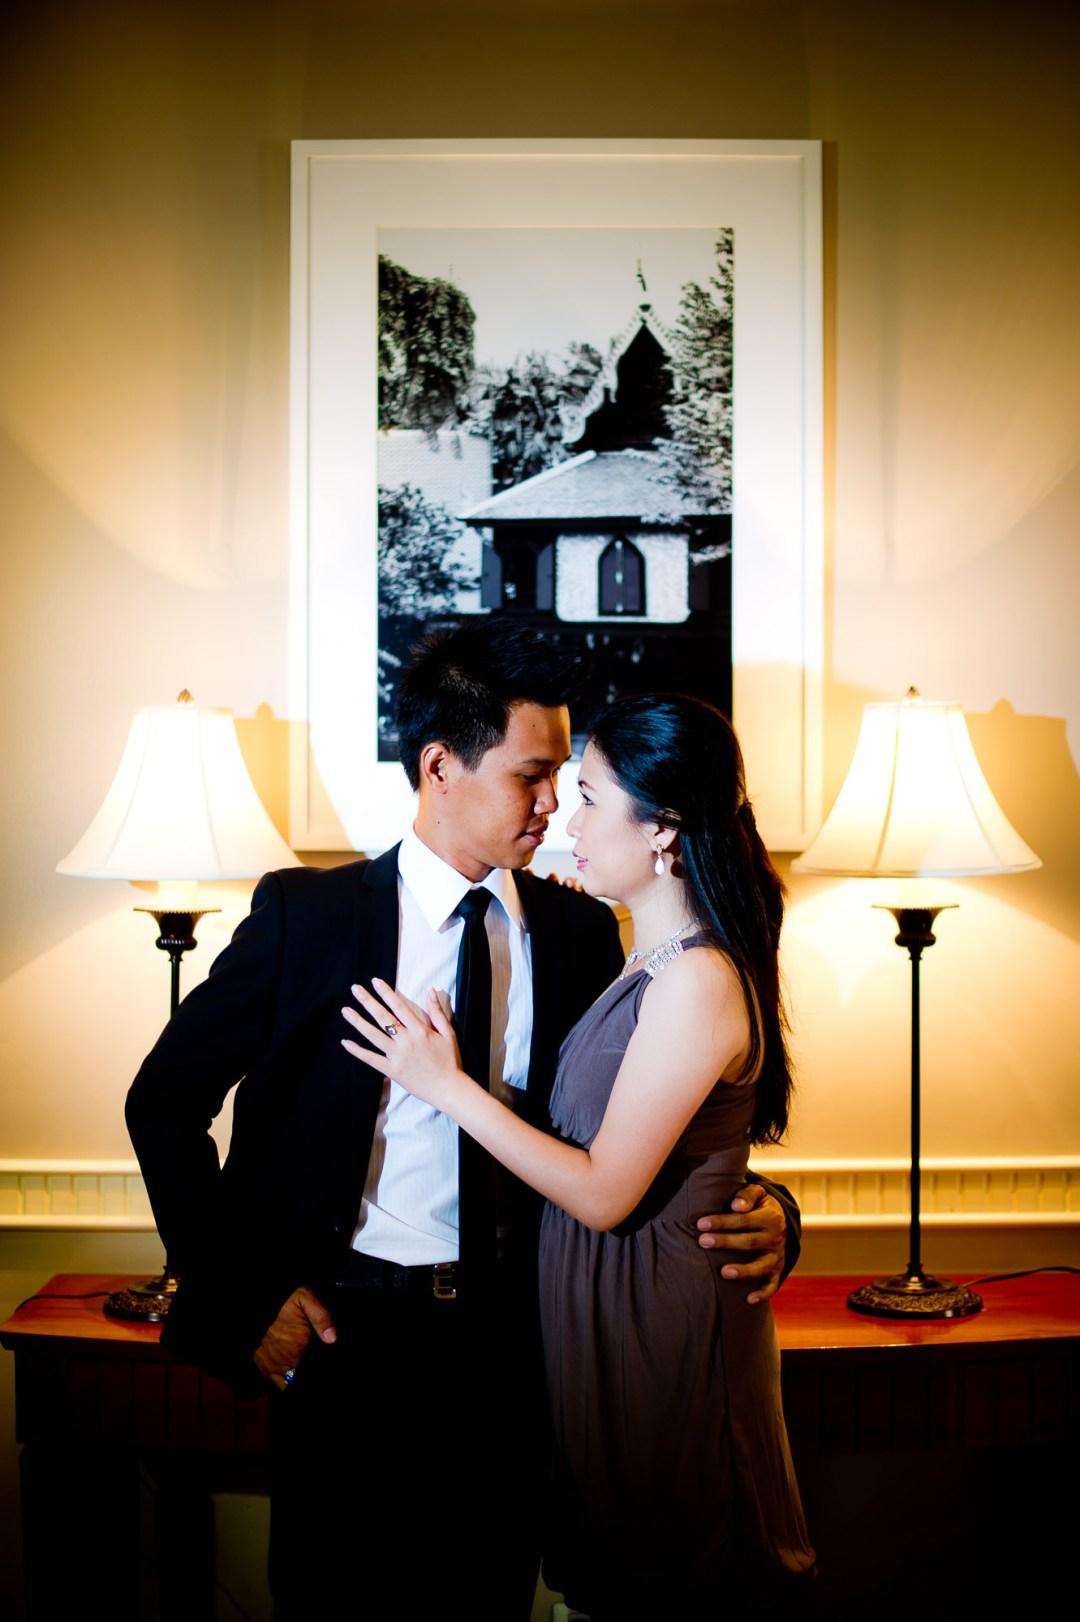 Bangkok Wedding Photography | Pre-Wedding Photography